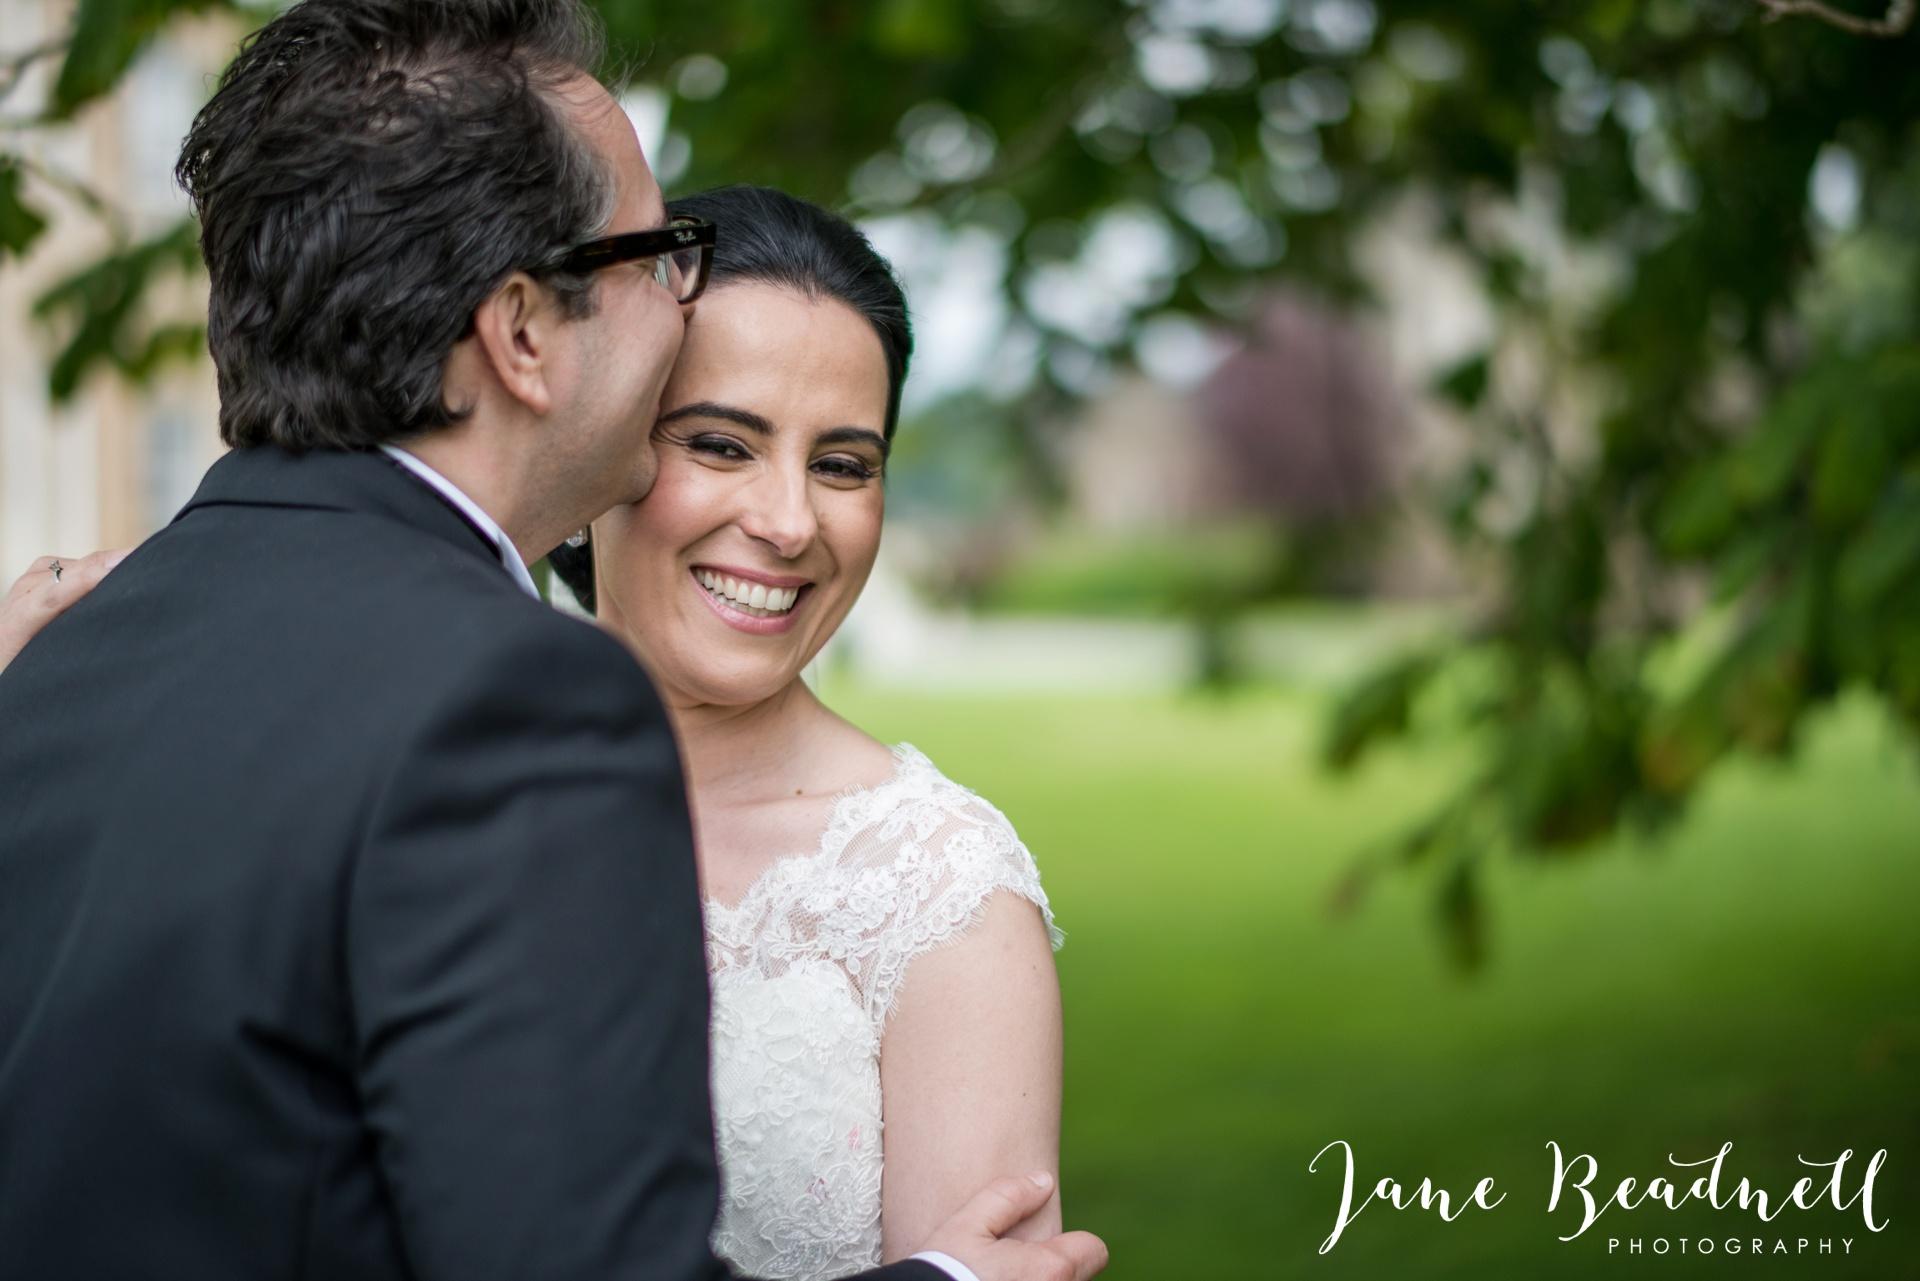 Jane Beadnell fine art wedding photographer Rudding Park Harrogate_0039